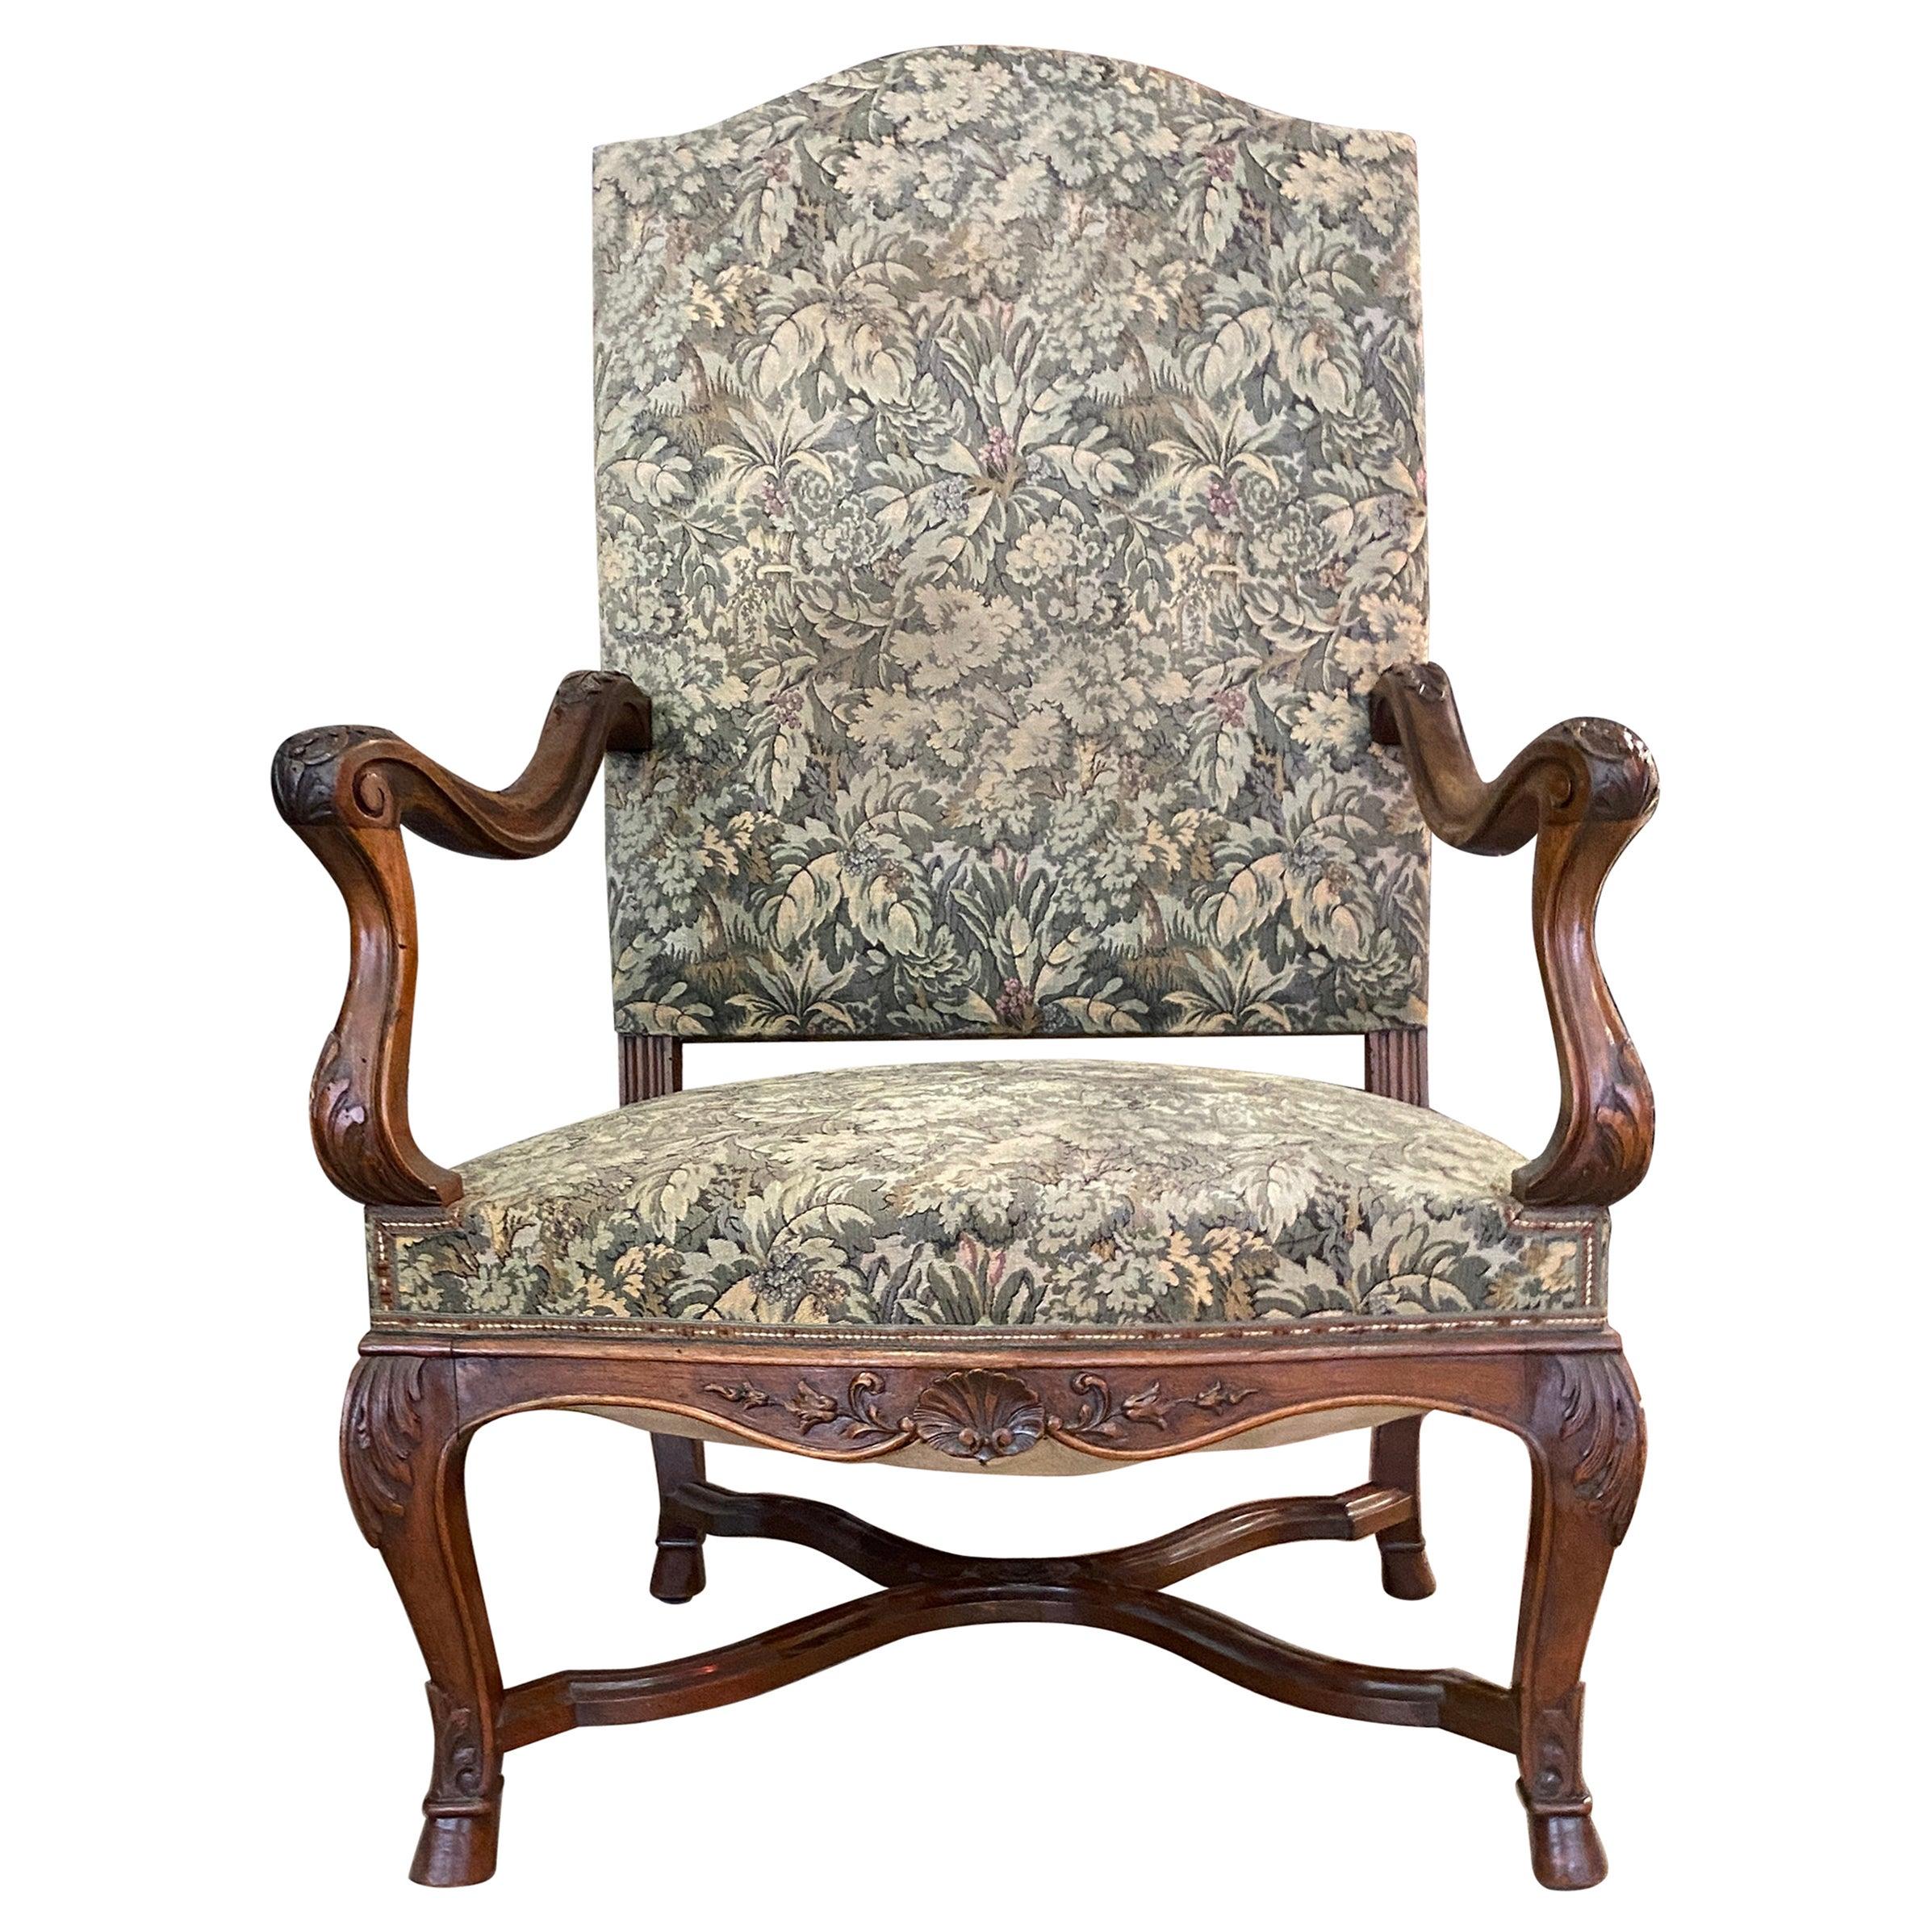 Large Louis XIV, Regency, Style Armchair, 19th Century